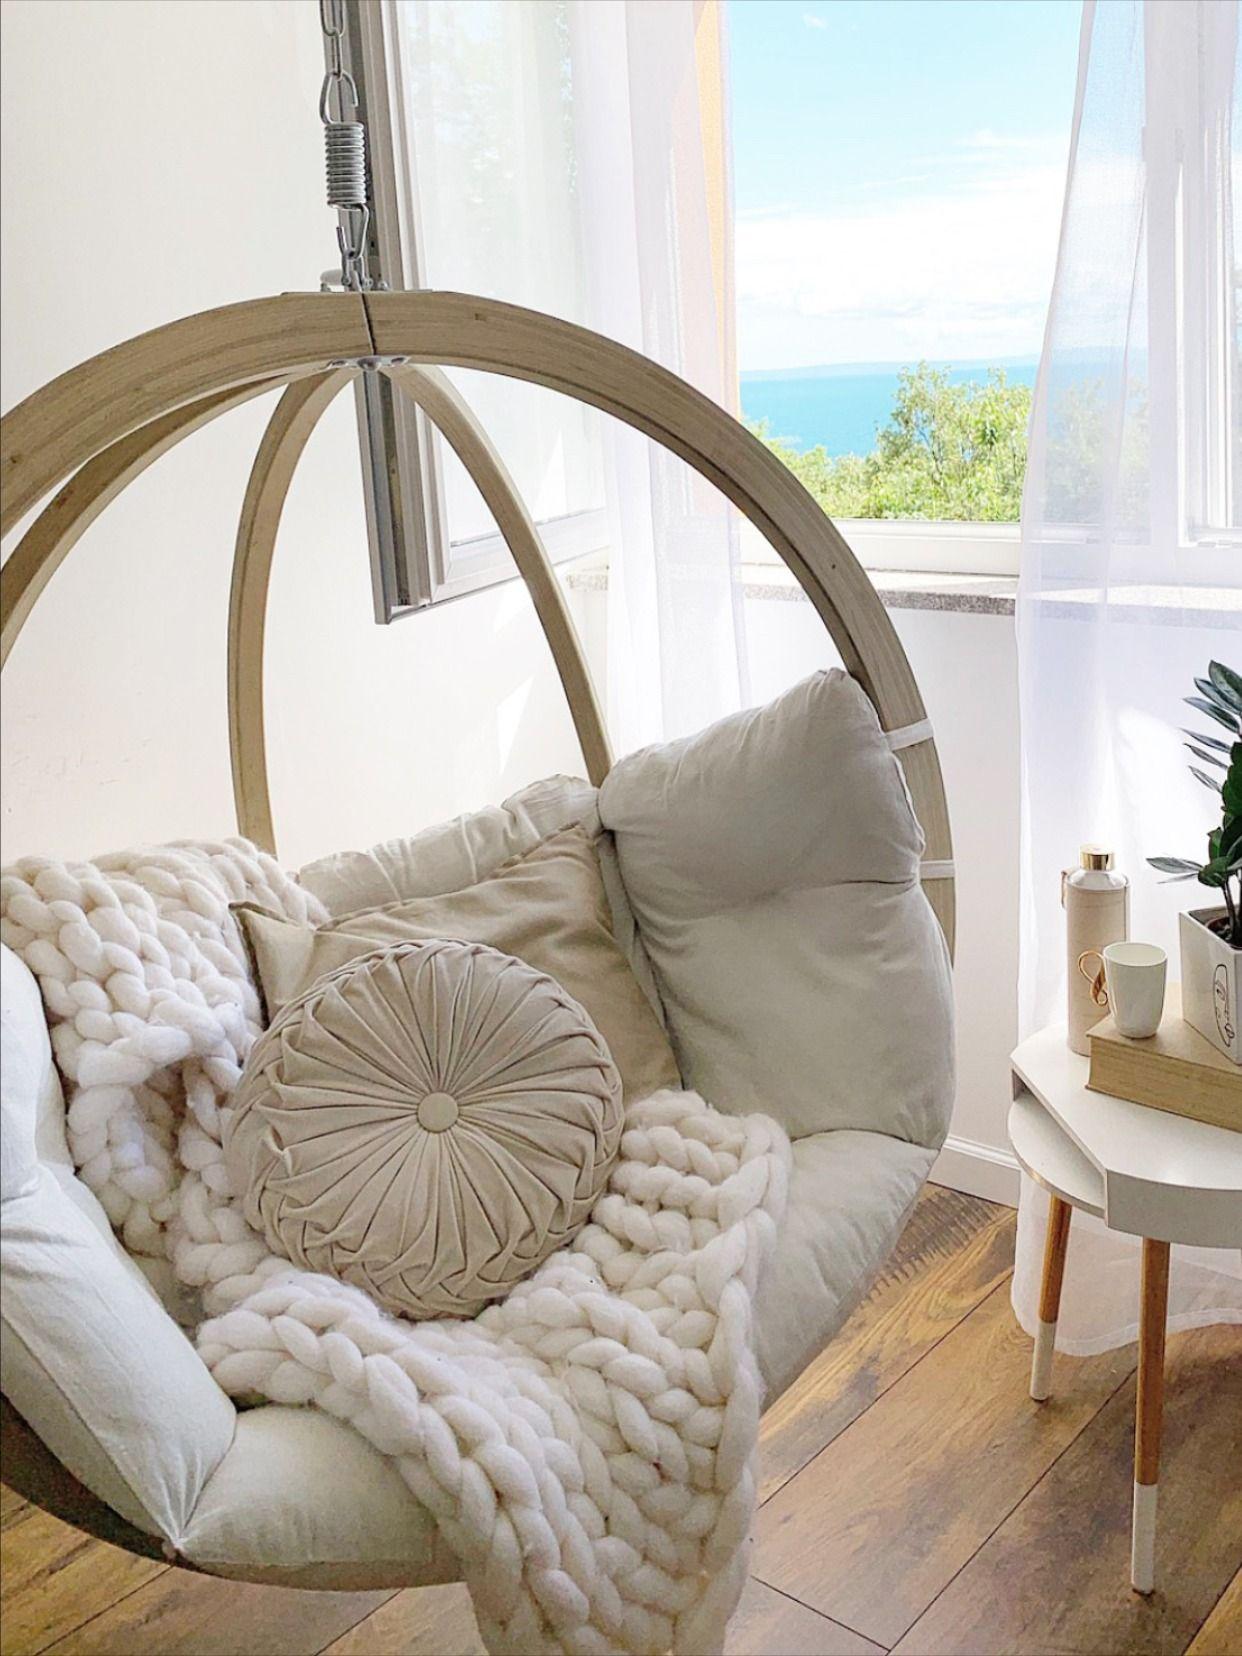 Park Art My WordPress Blog_Corner Hanging Chair For Bedroom